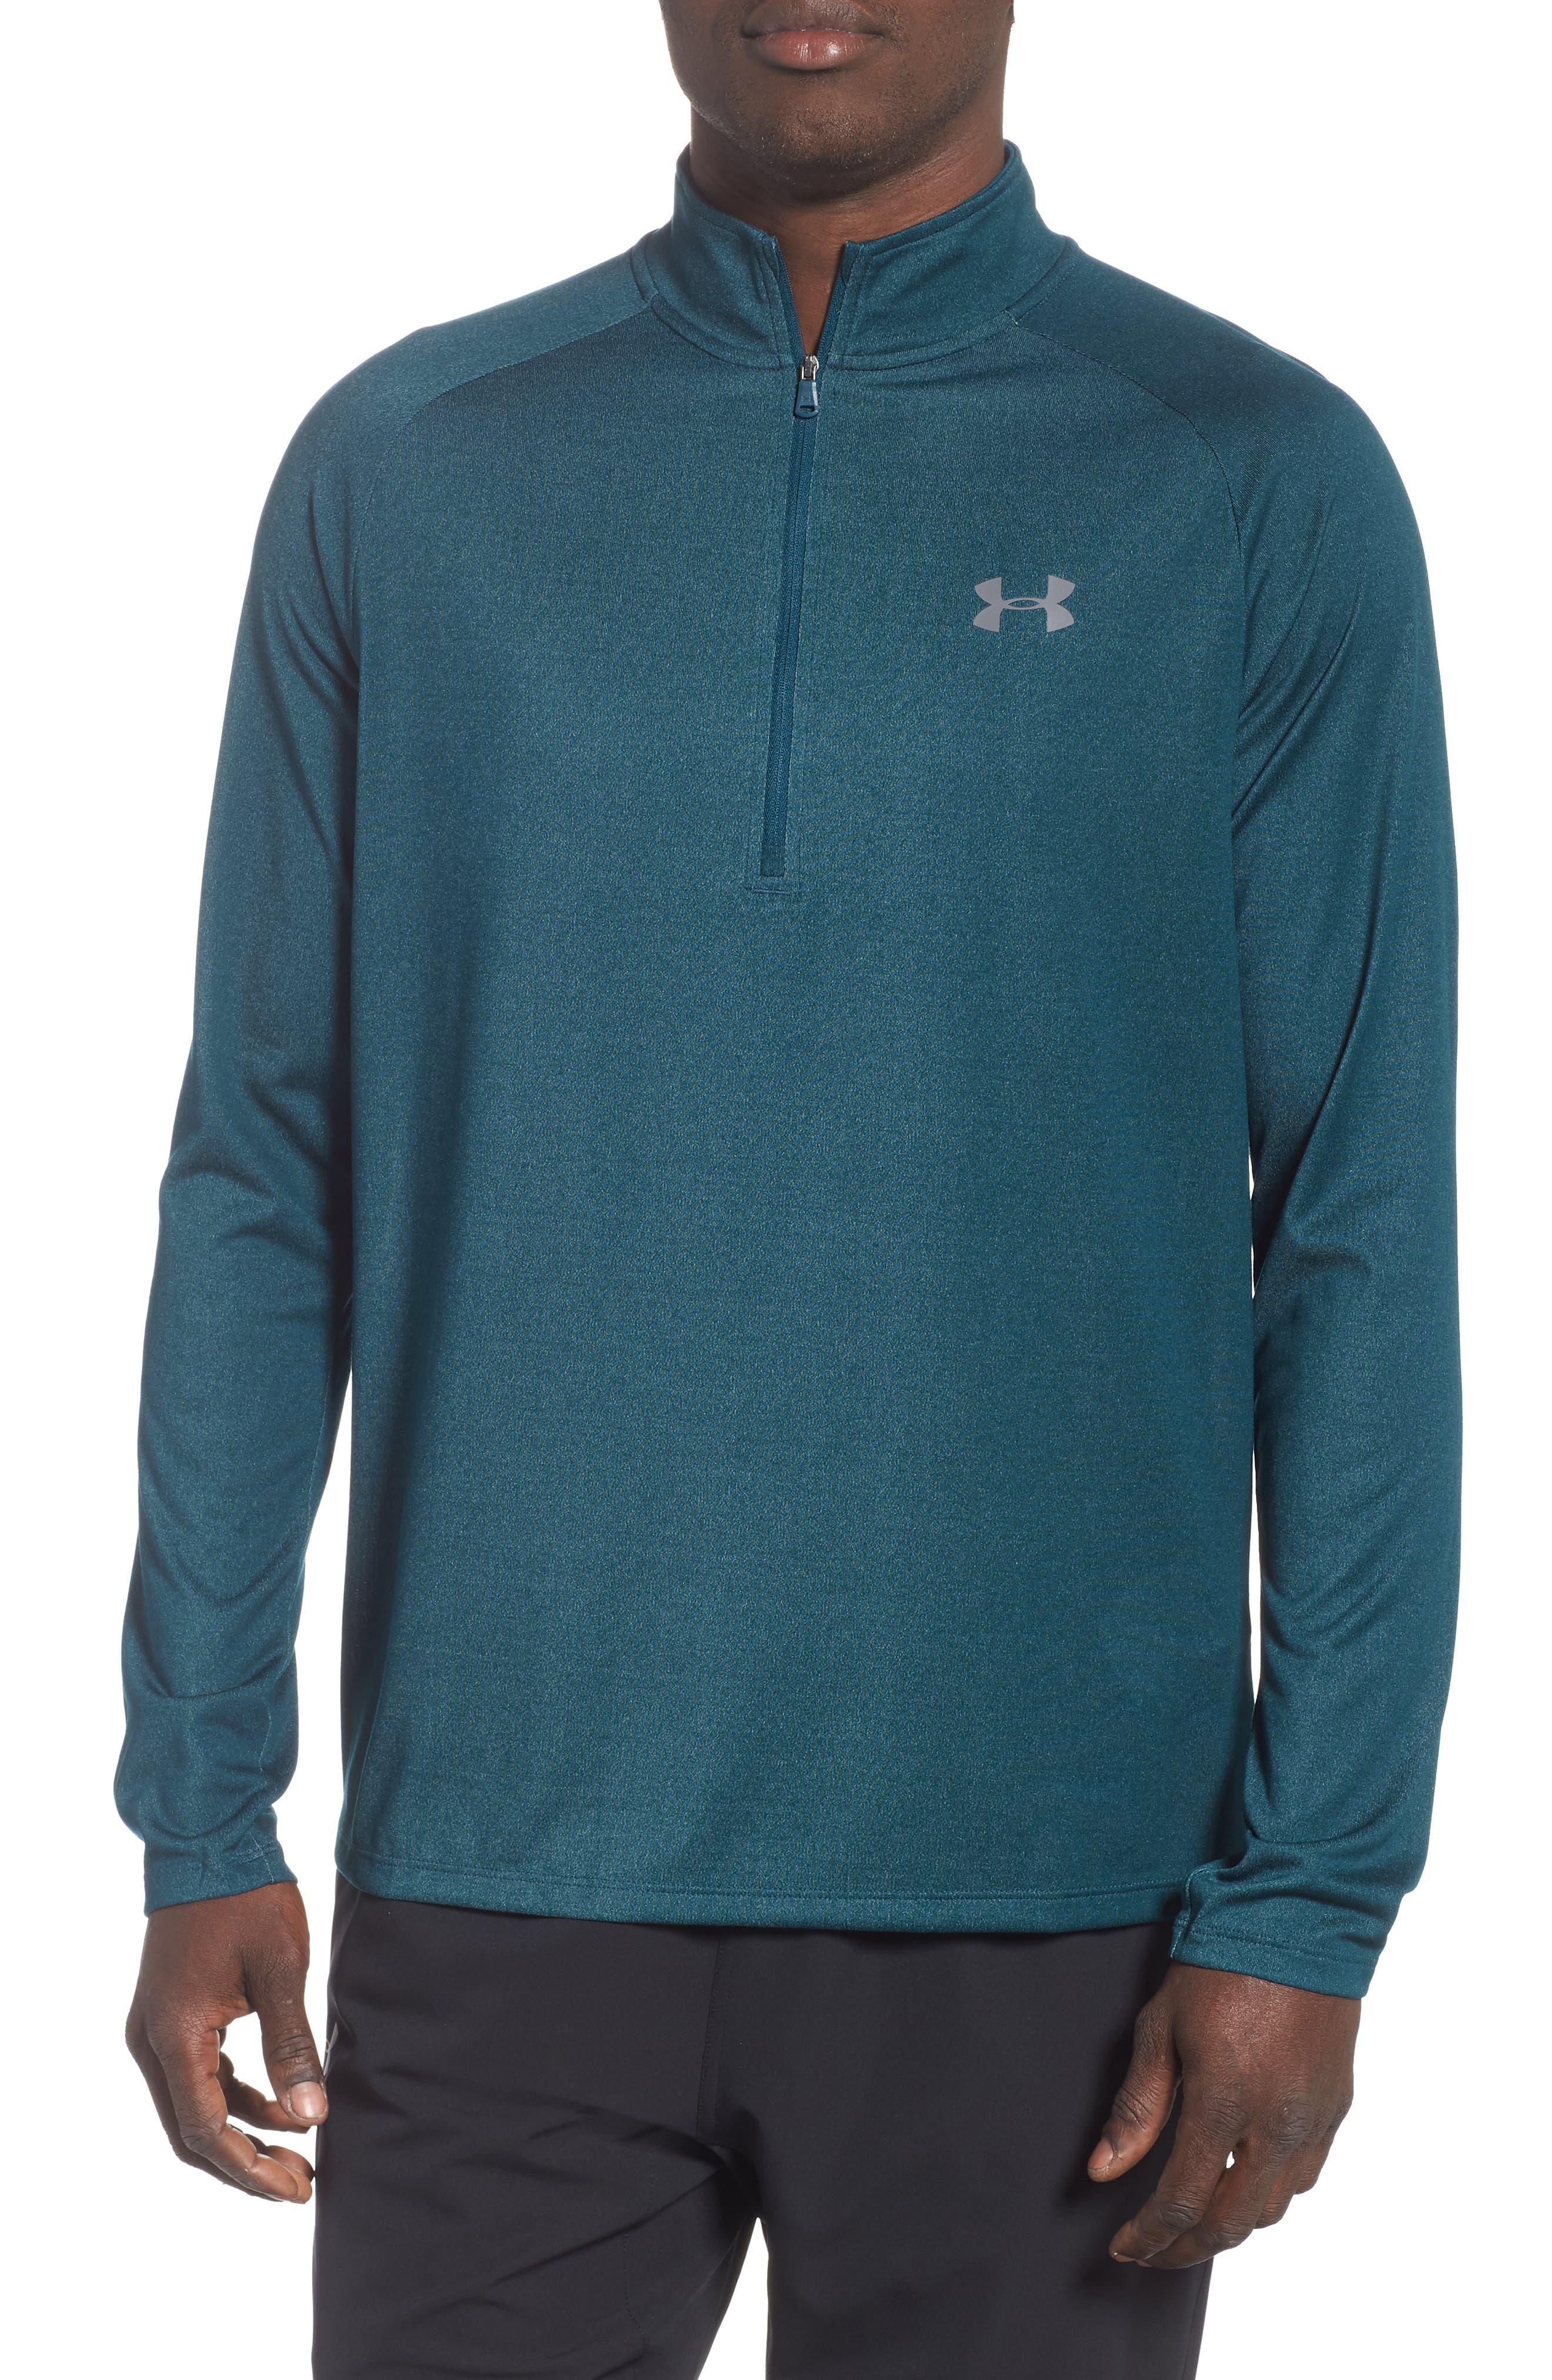 Tech Half Zip Sweatshirt,                             Main thumbnail 1, color,                             TEAL